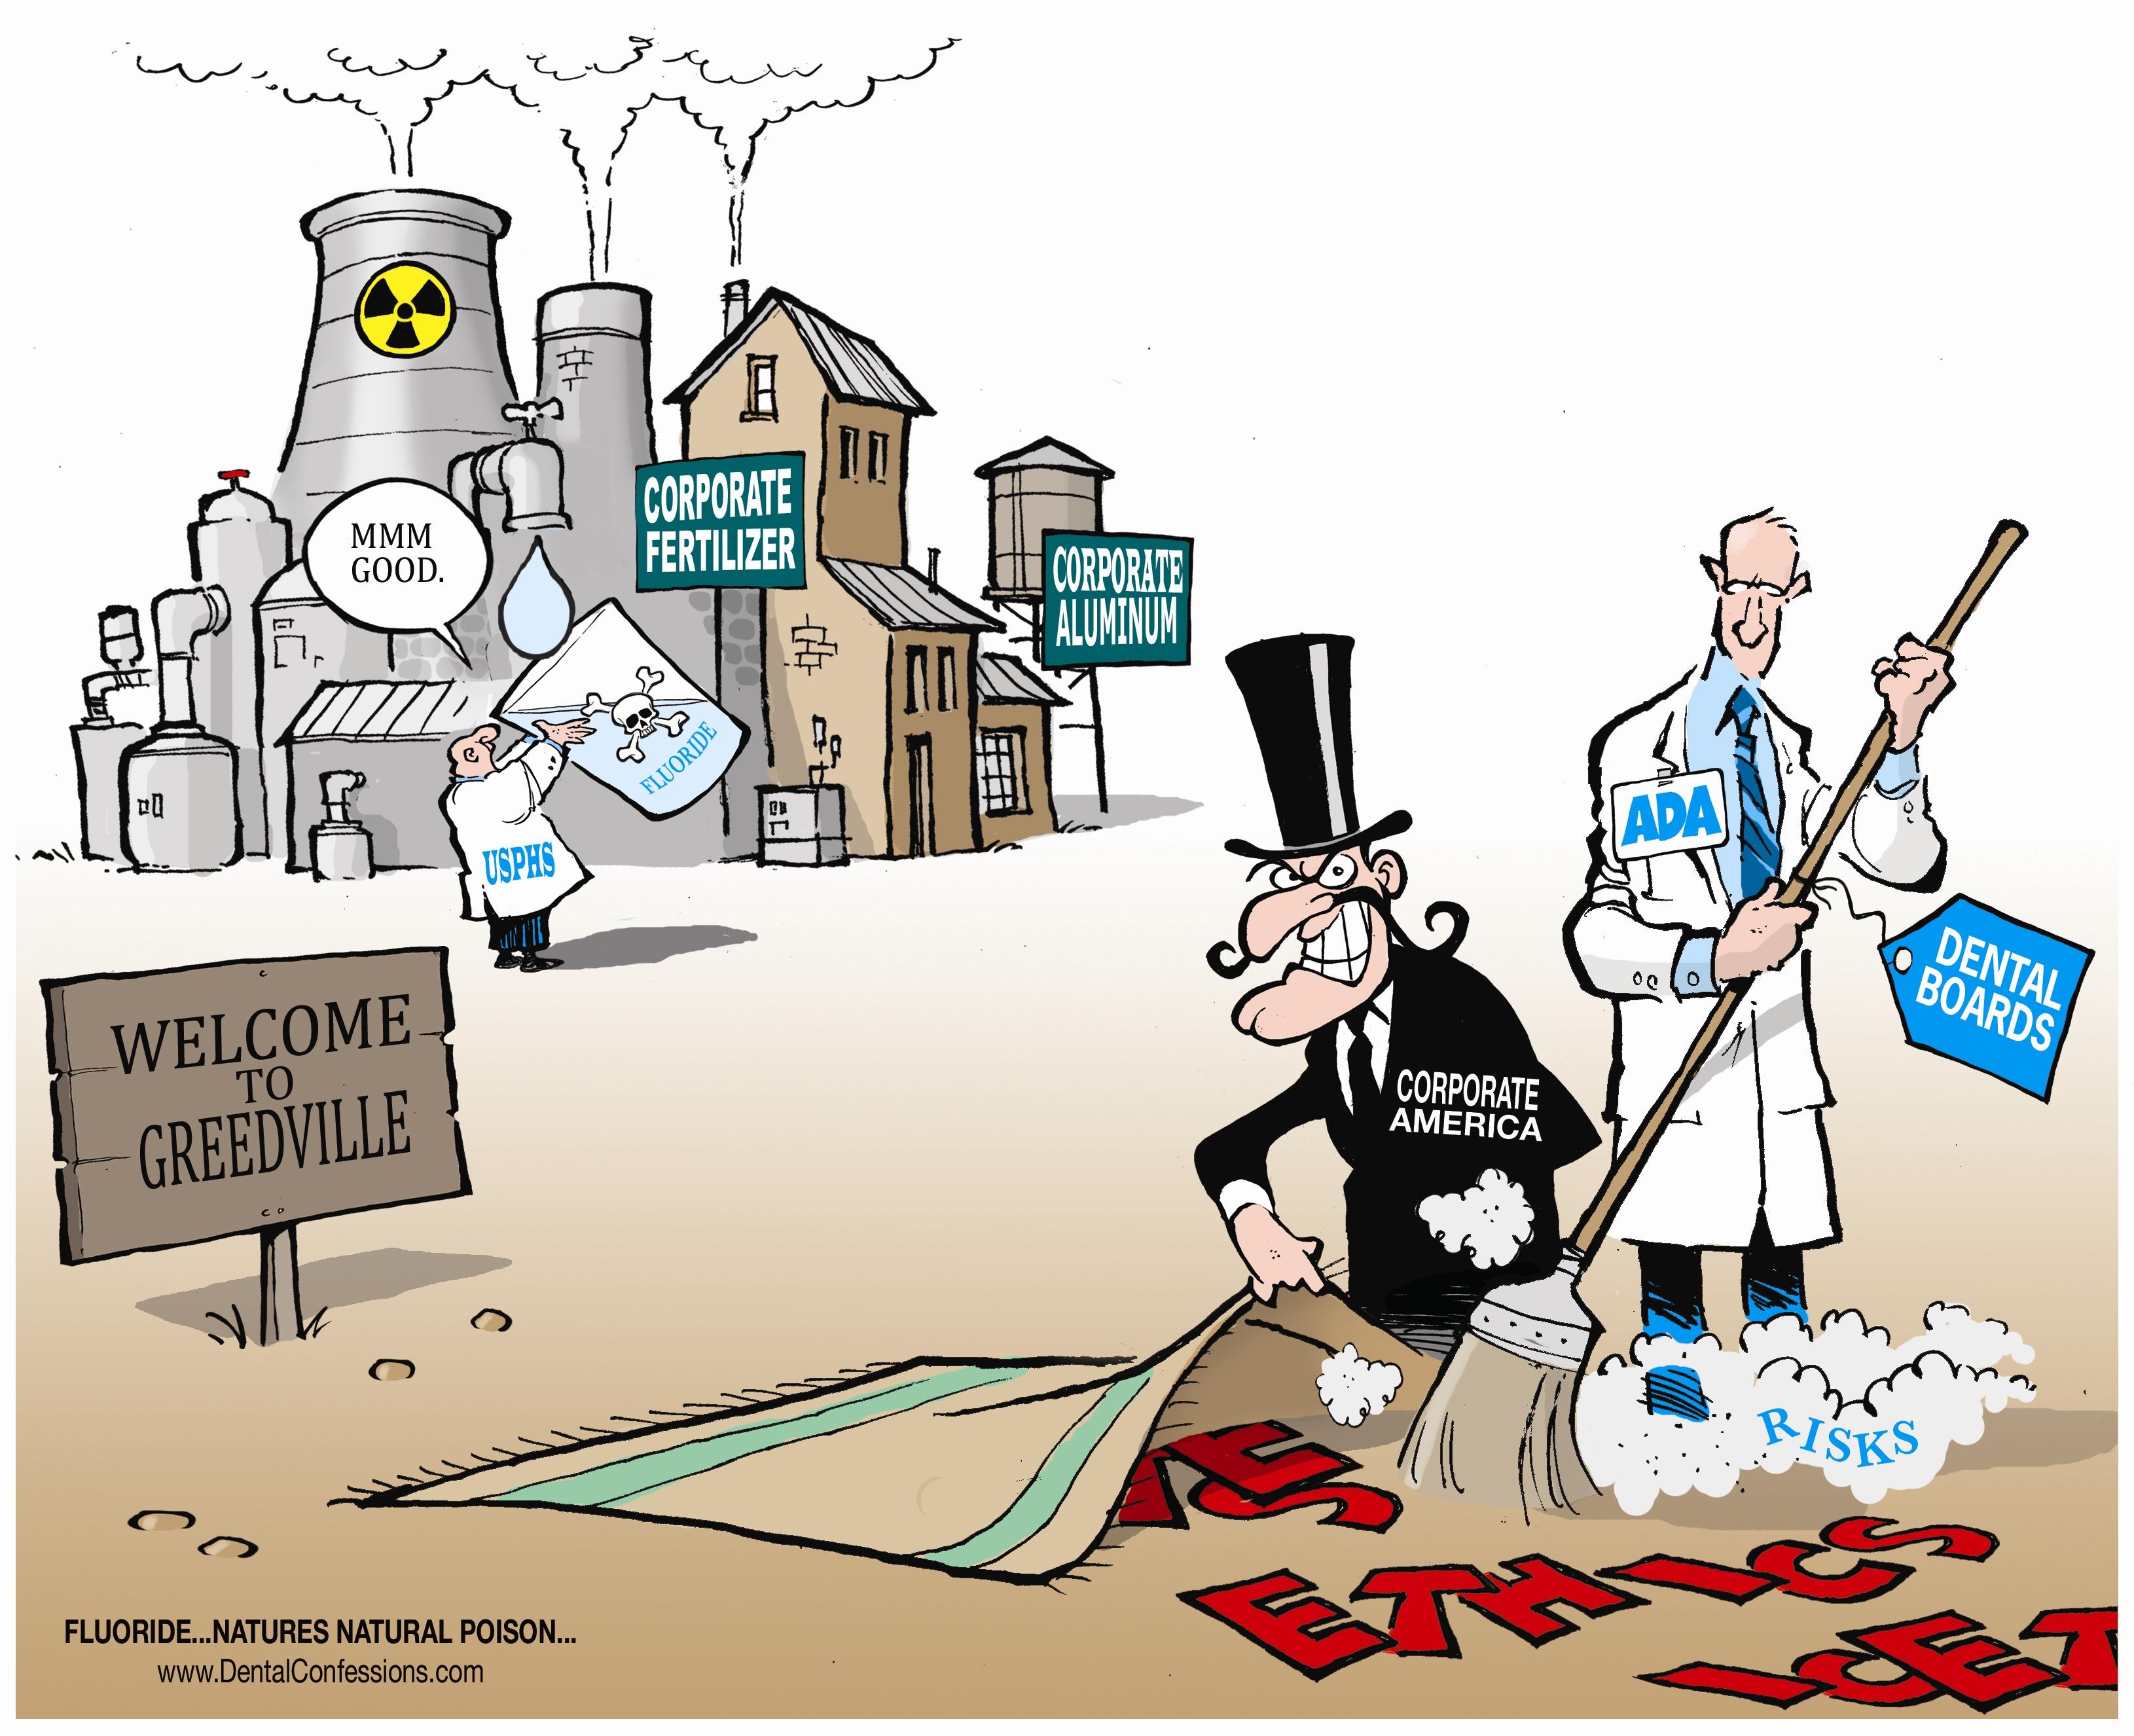 Fluoride Industrial Waste clean, water, california, fluoridation, fluoride, san francisco